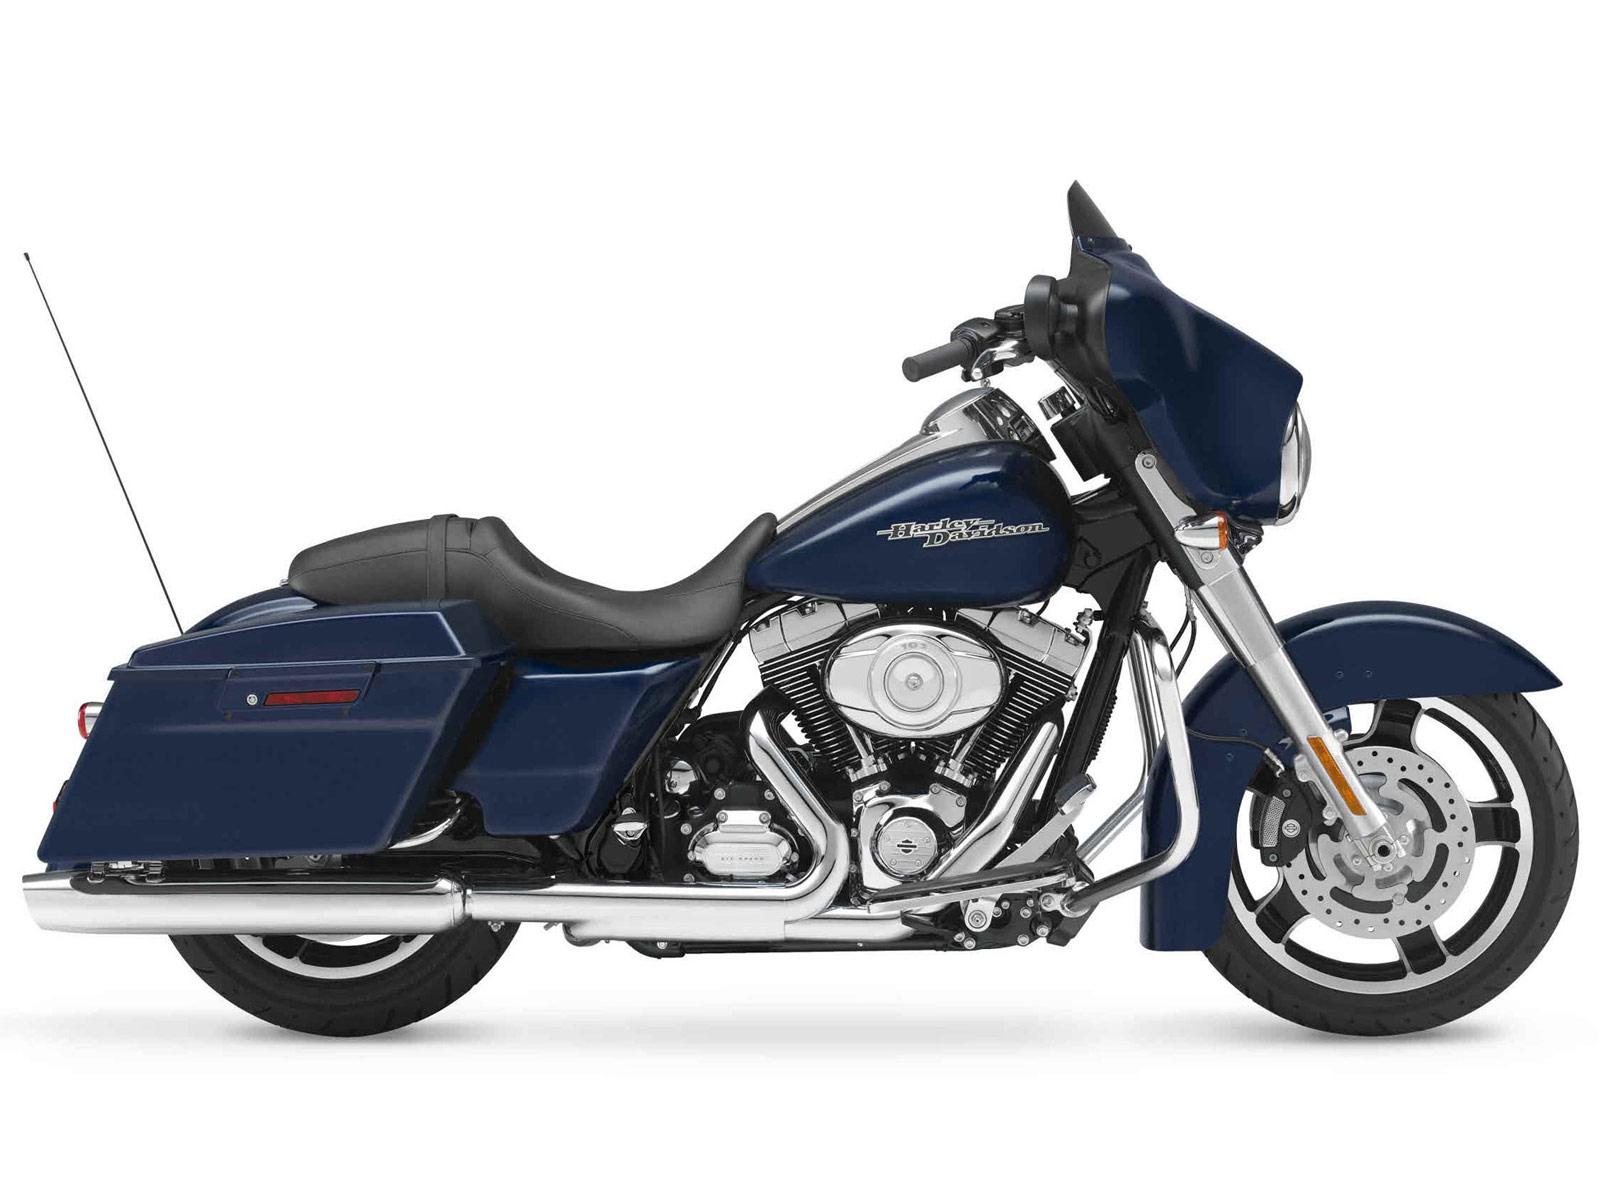 2012 Harley Davidson FLHX Street Glide pictures